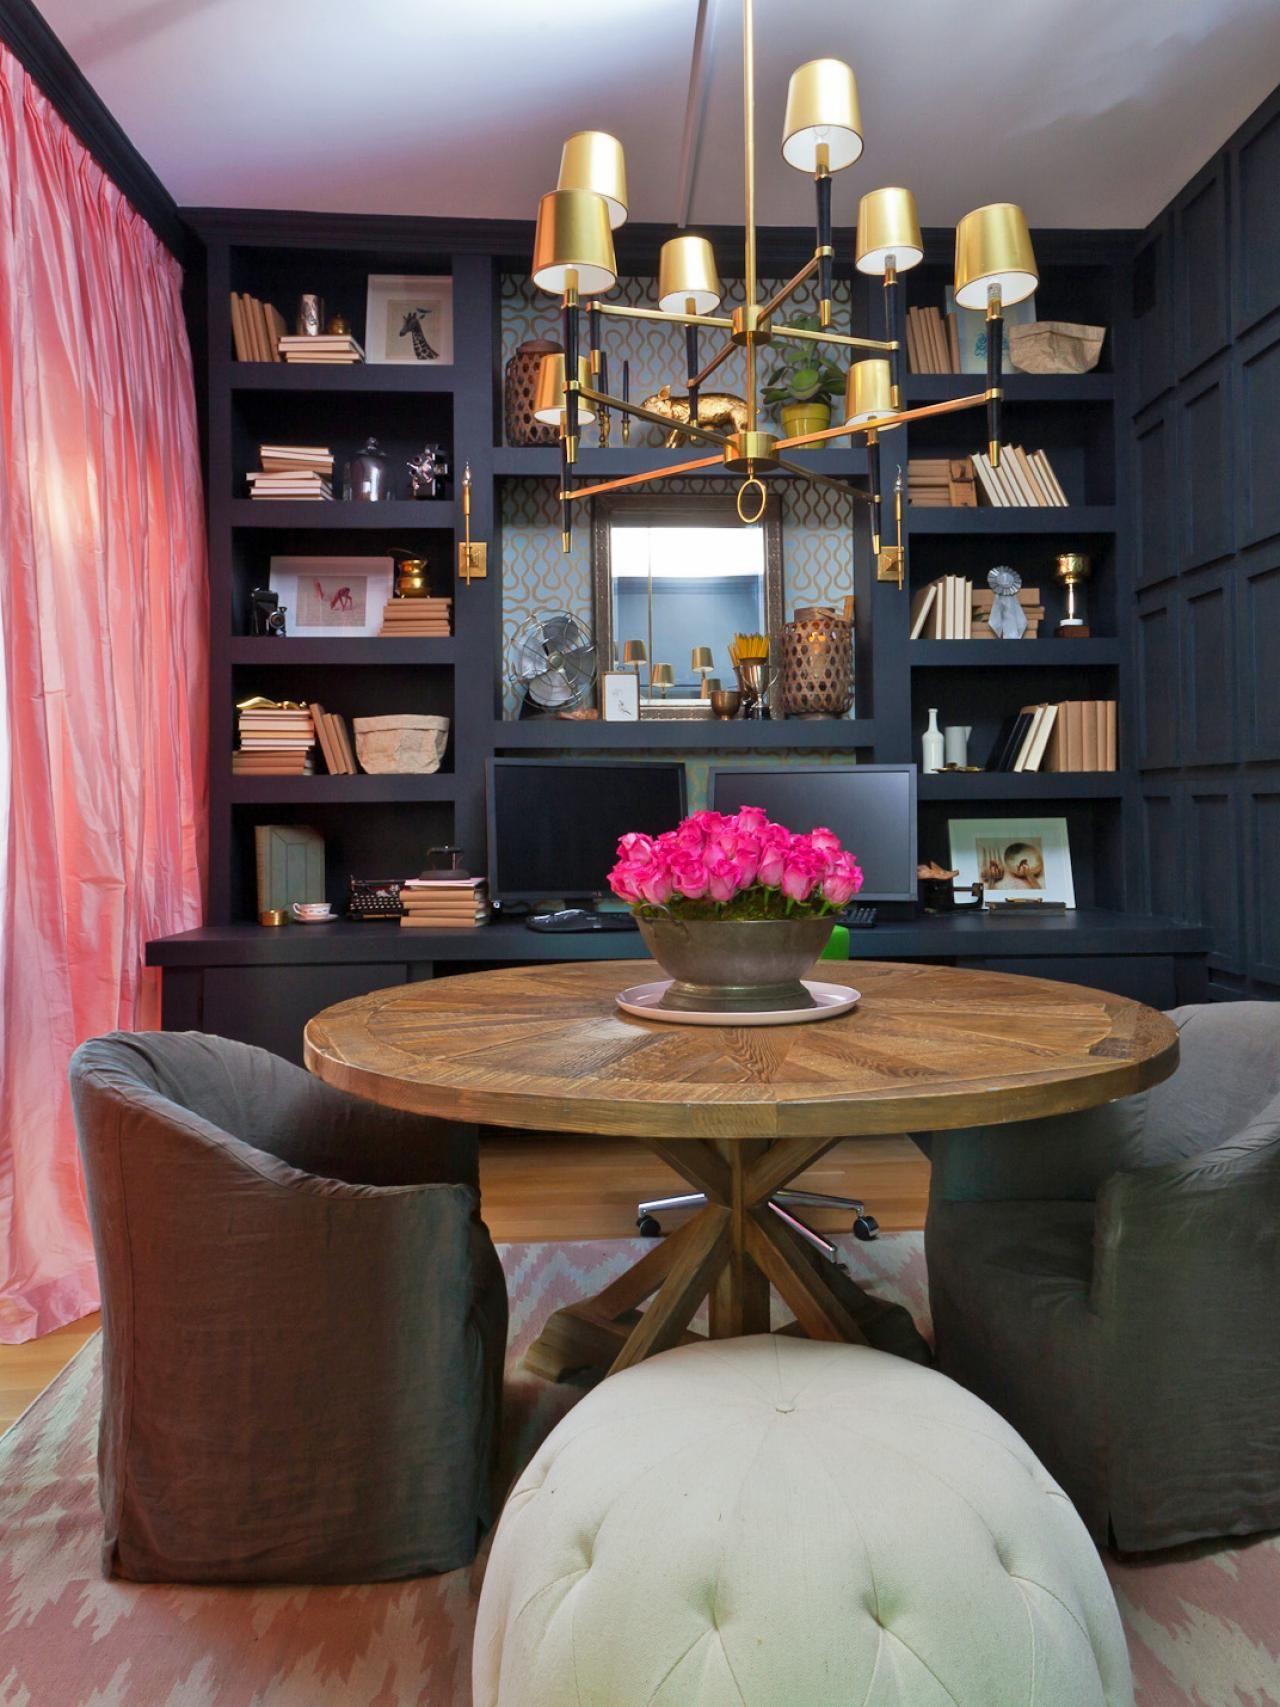 hgtv office design. Find The Best Of Dear Genevieve From HGTV Hgtv Office Design